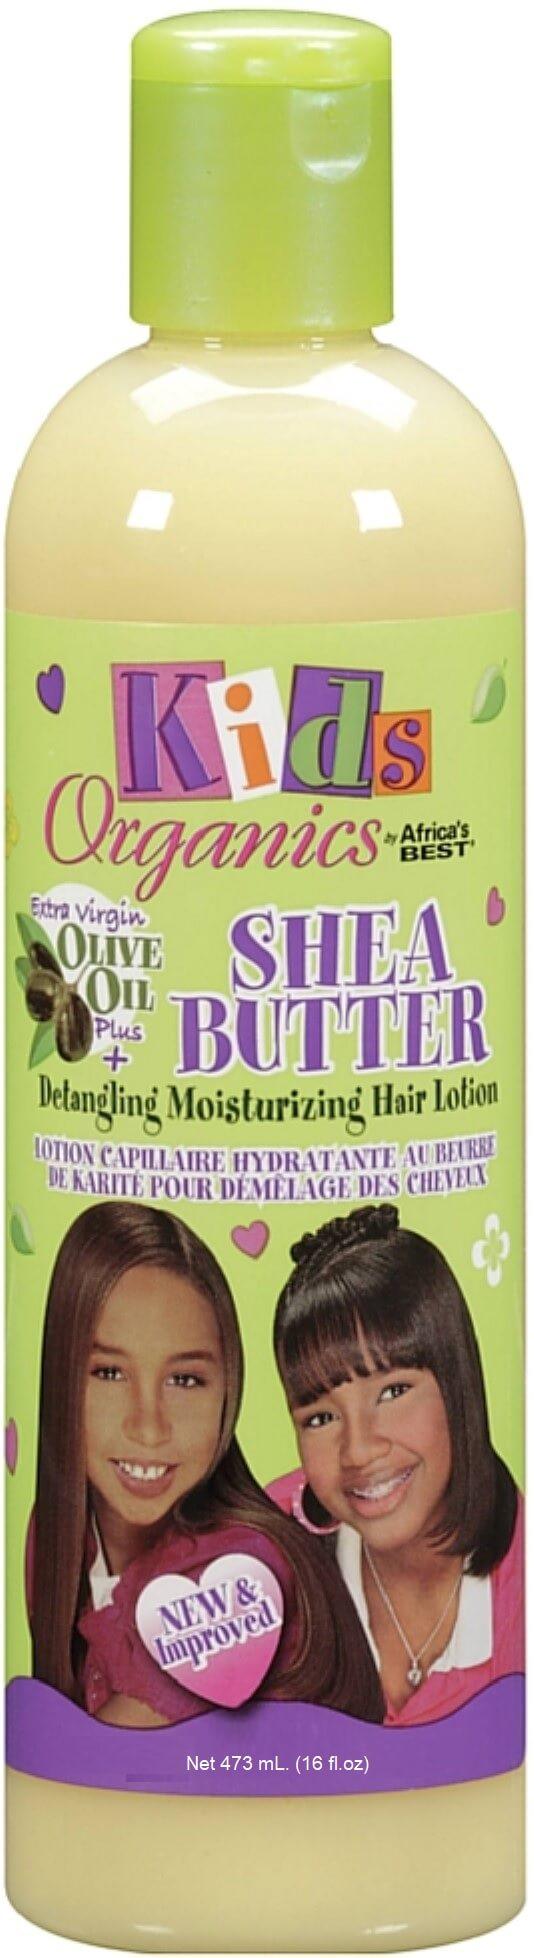 SHEA BUTTER DETANGLING MOISTURIZING HAIR LOTION